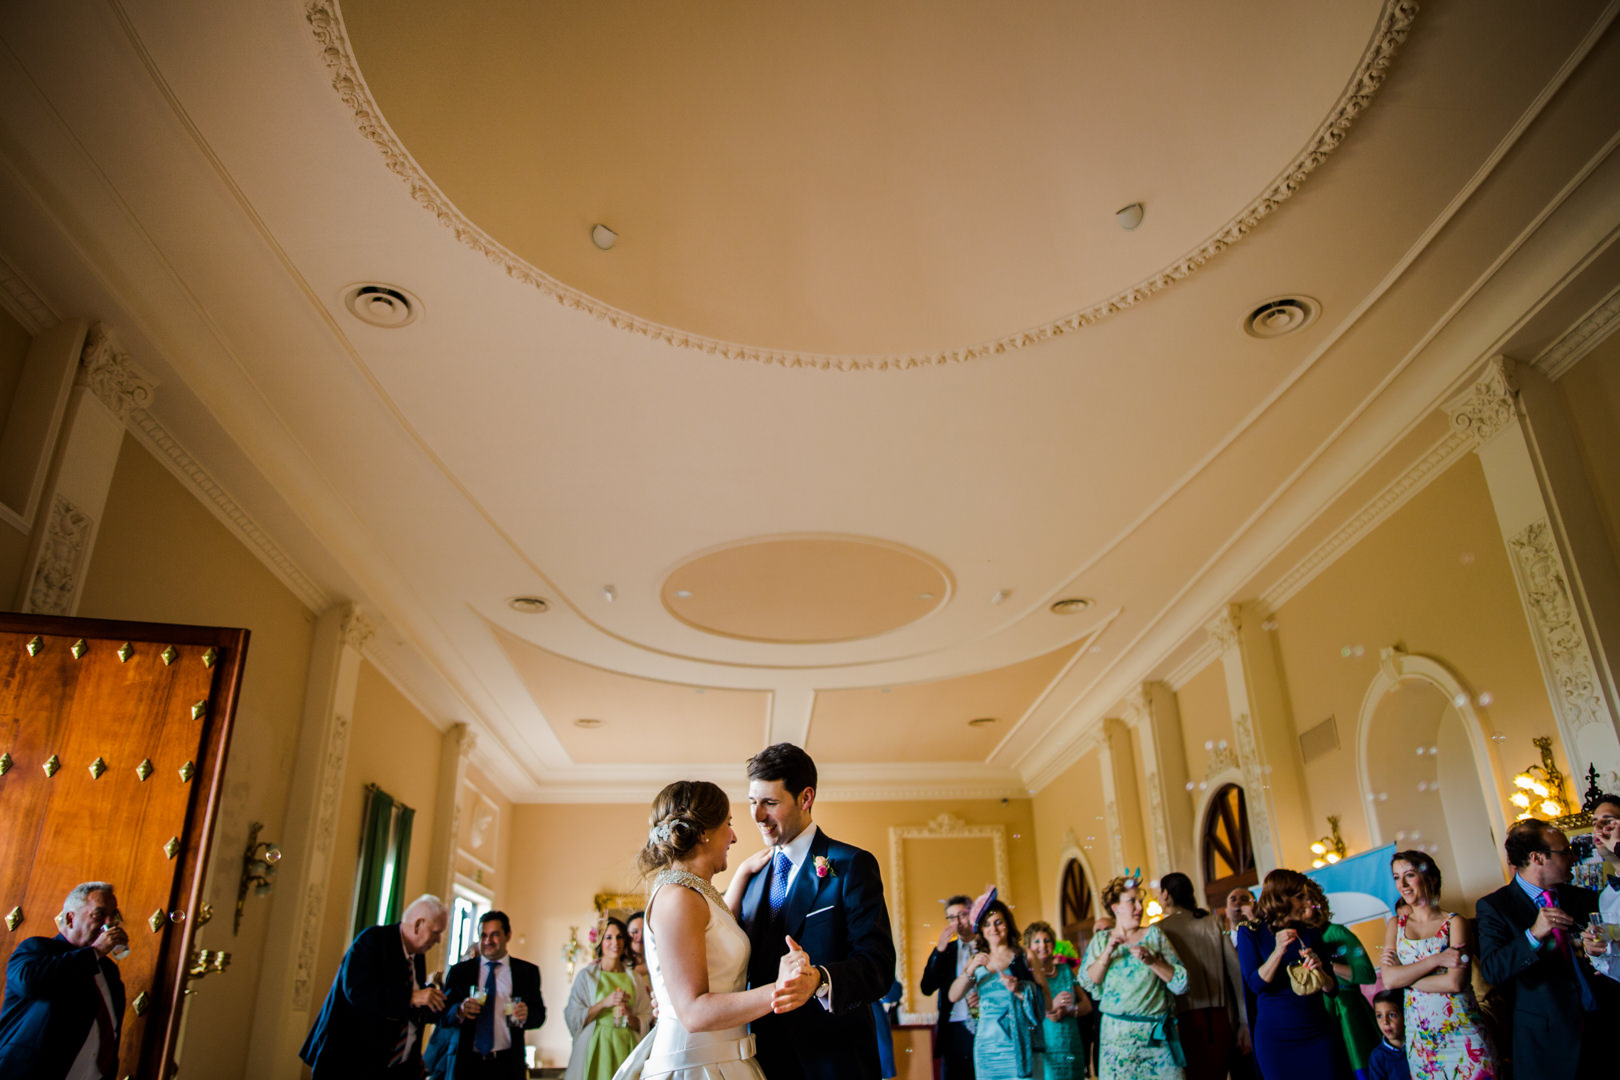 Boda-Catedral-Jaen-Hamburgo-Maria-David-engagement-Rafael-Torres-fotografo-bodas-sevilla-madrid-barcelona-wedding-photographer--40.jpg